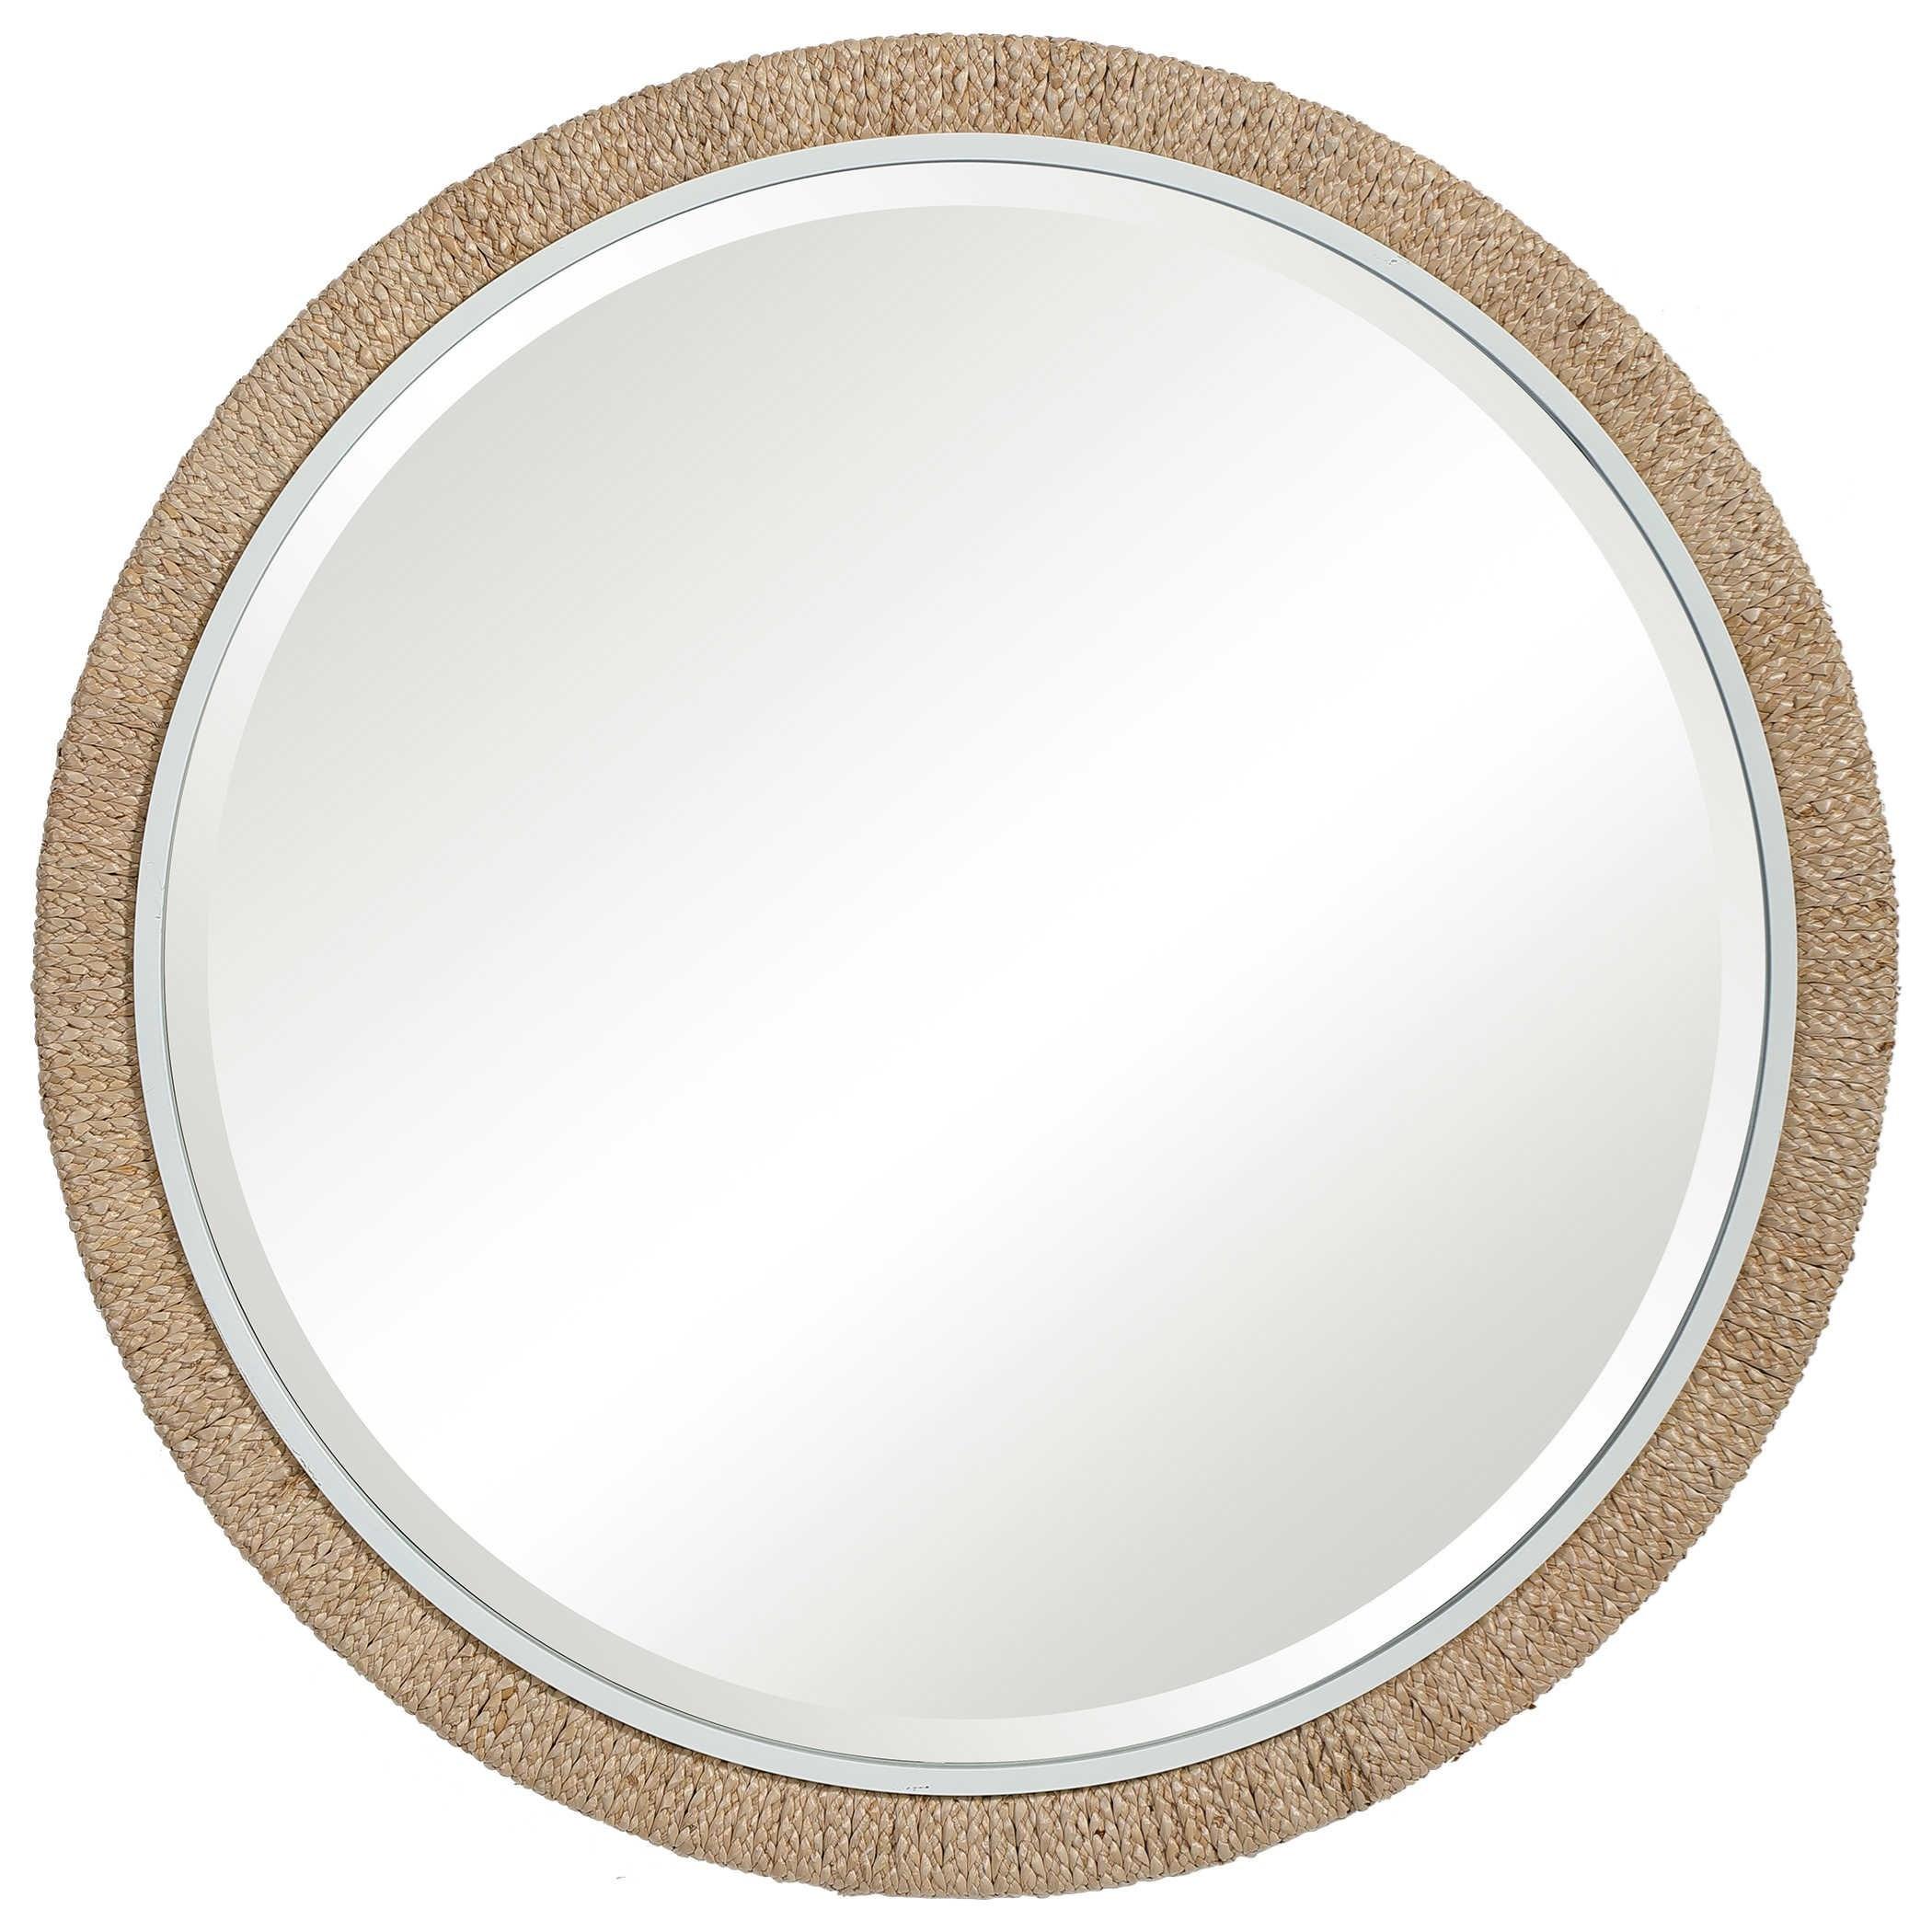 Mirrors - Round Carbet Round Mirror by Uttermost at Suburban Furniture